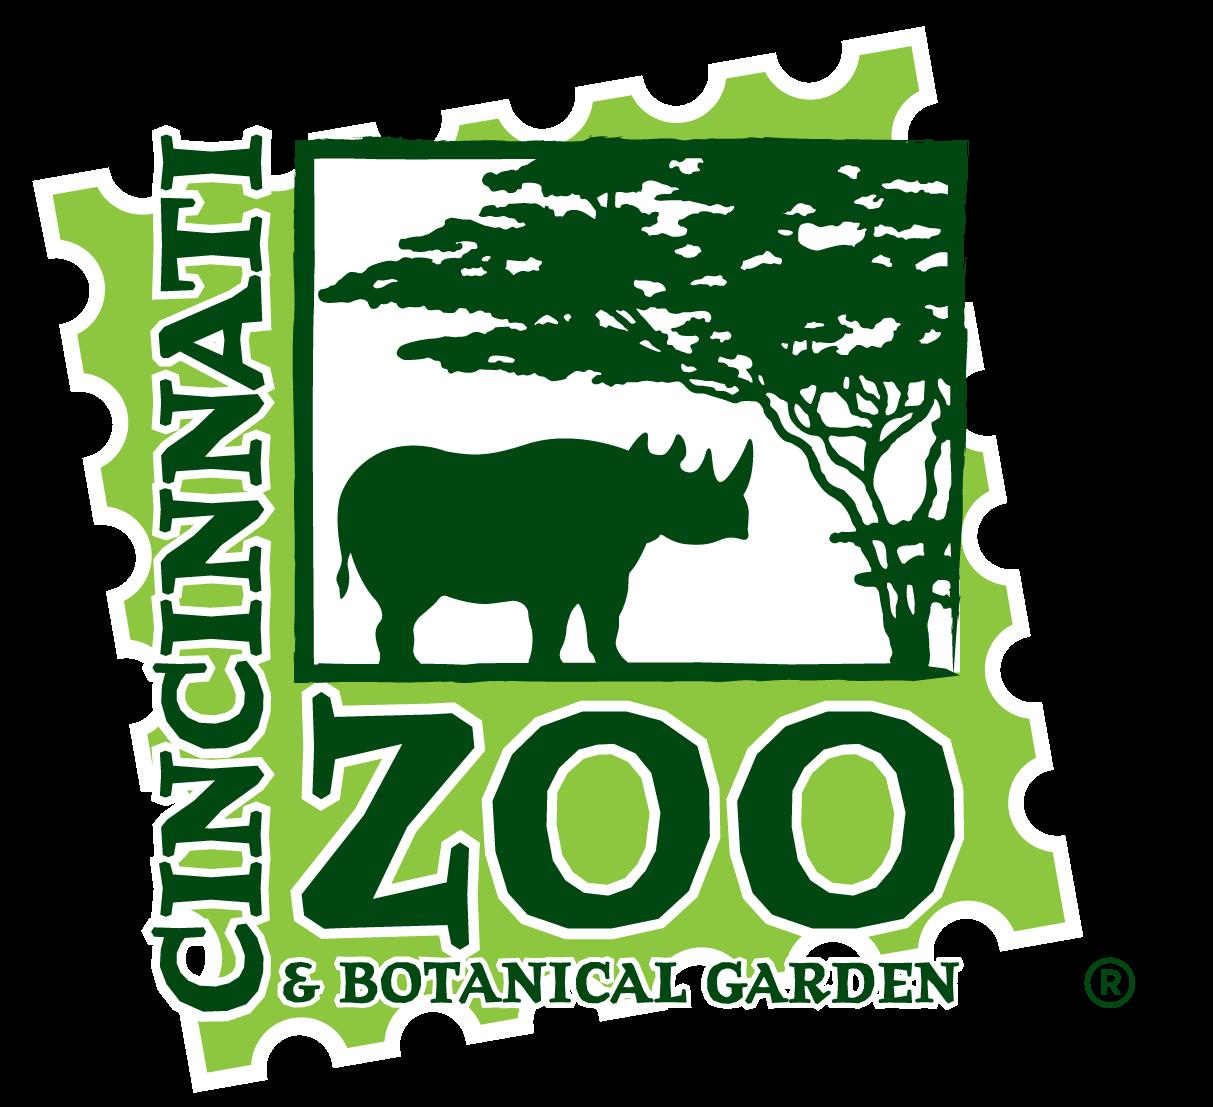 cincinnati zoo logo